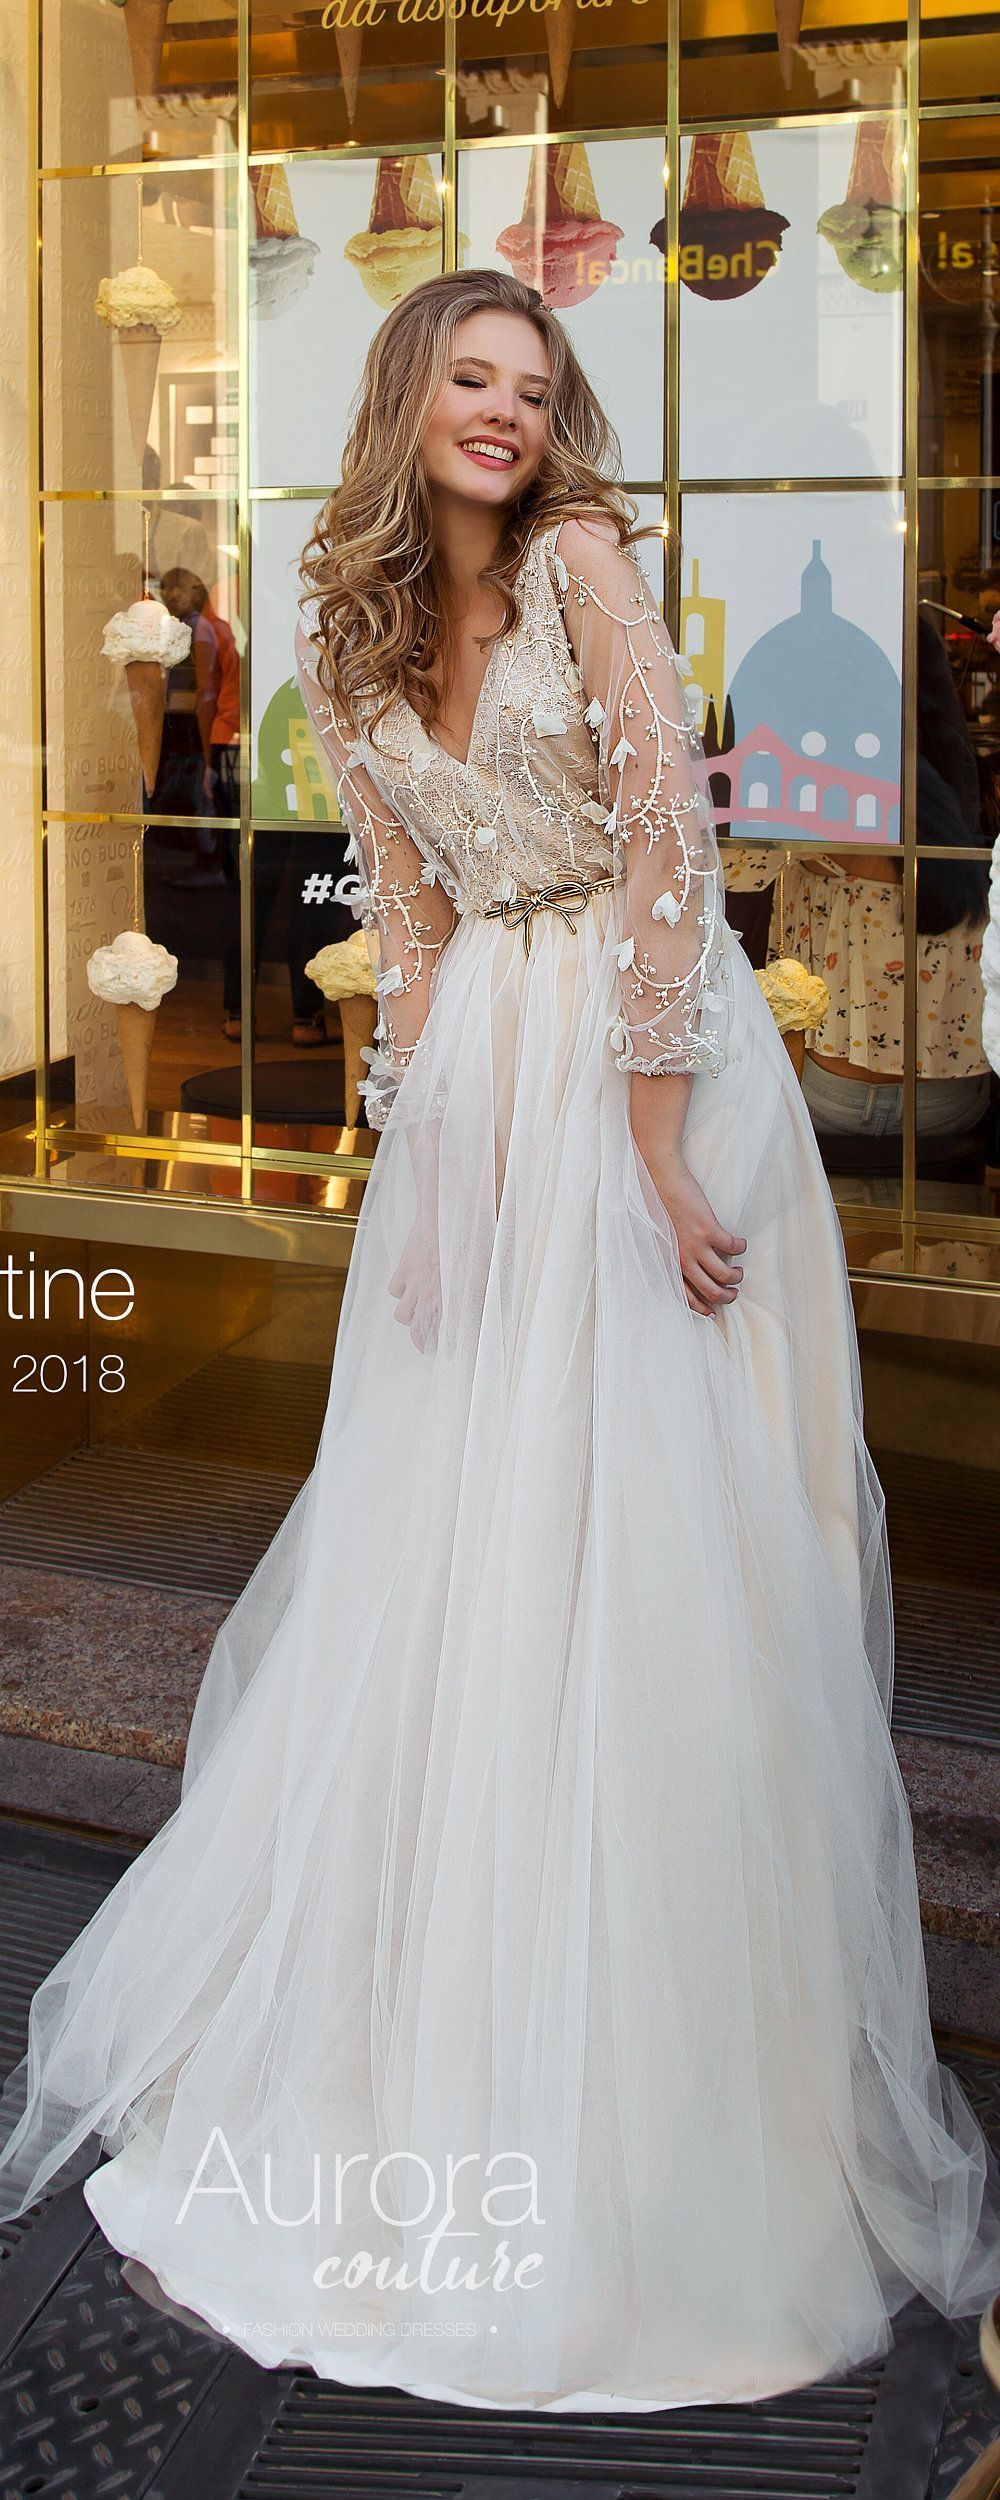 Lace wedding dress for plus size january 2019 Bohemian wedding dress wedding dress long sleeve wedding dress